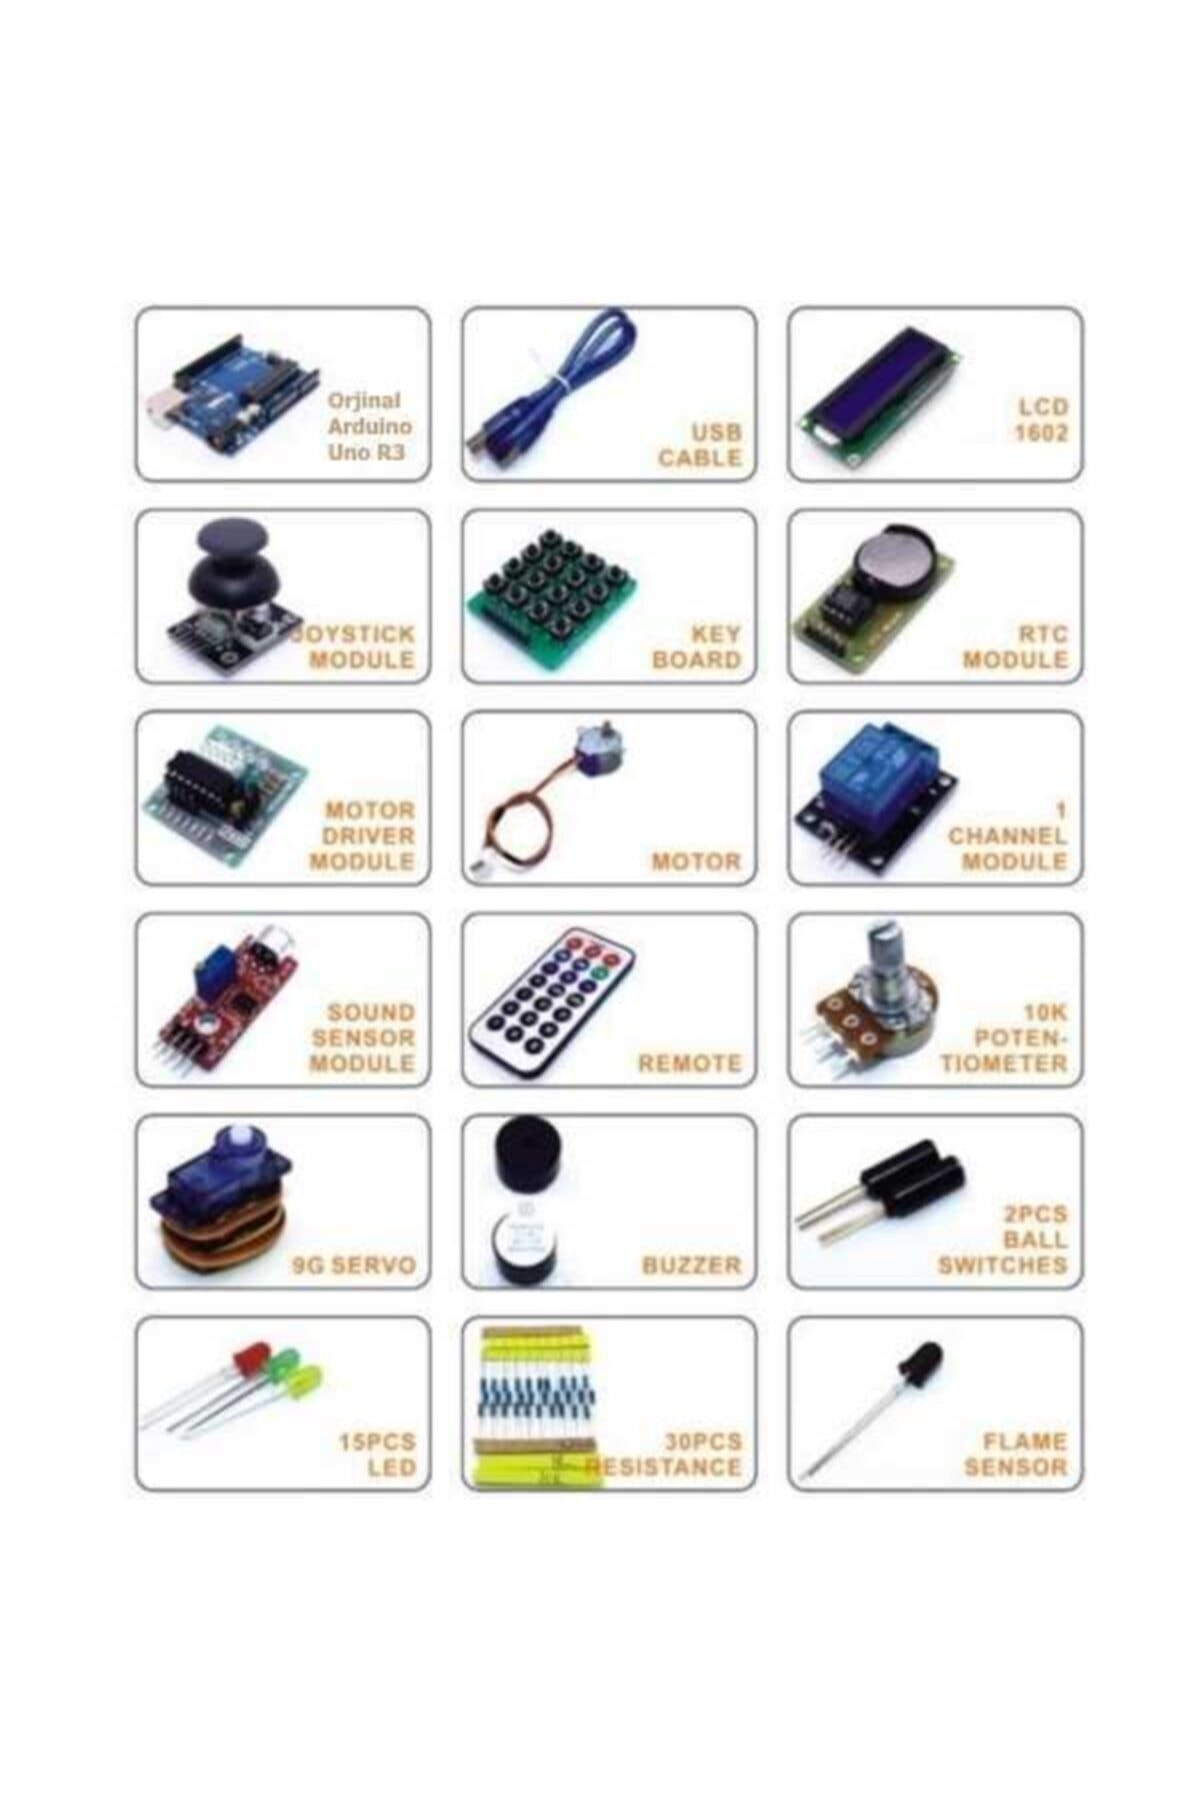 Robolink Teknoloji Orjinal Arduino Uno Rfıd Kit Seti 2